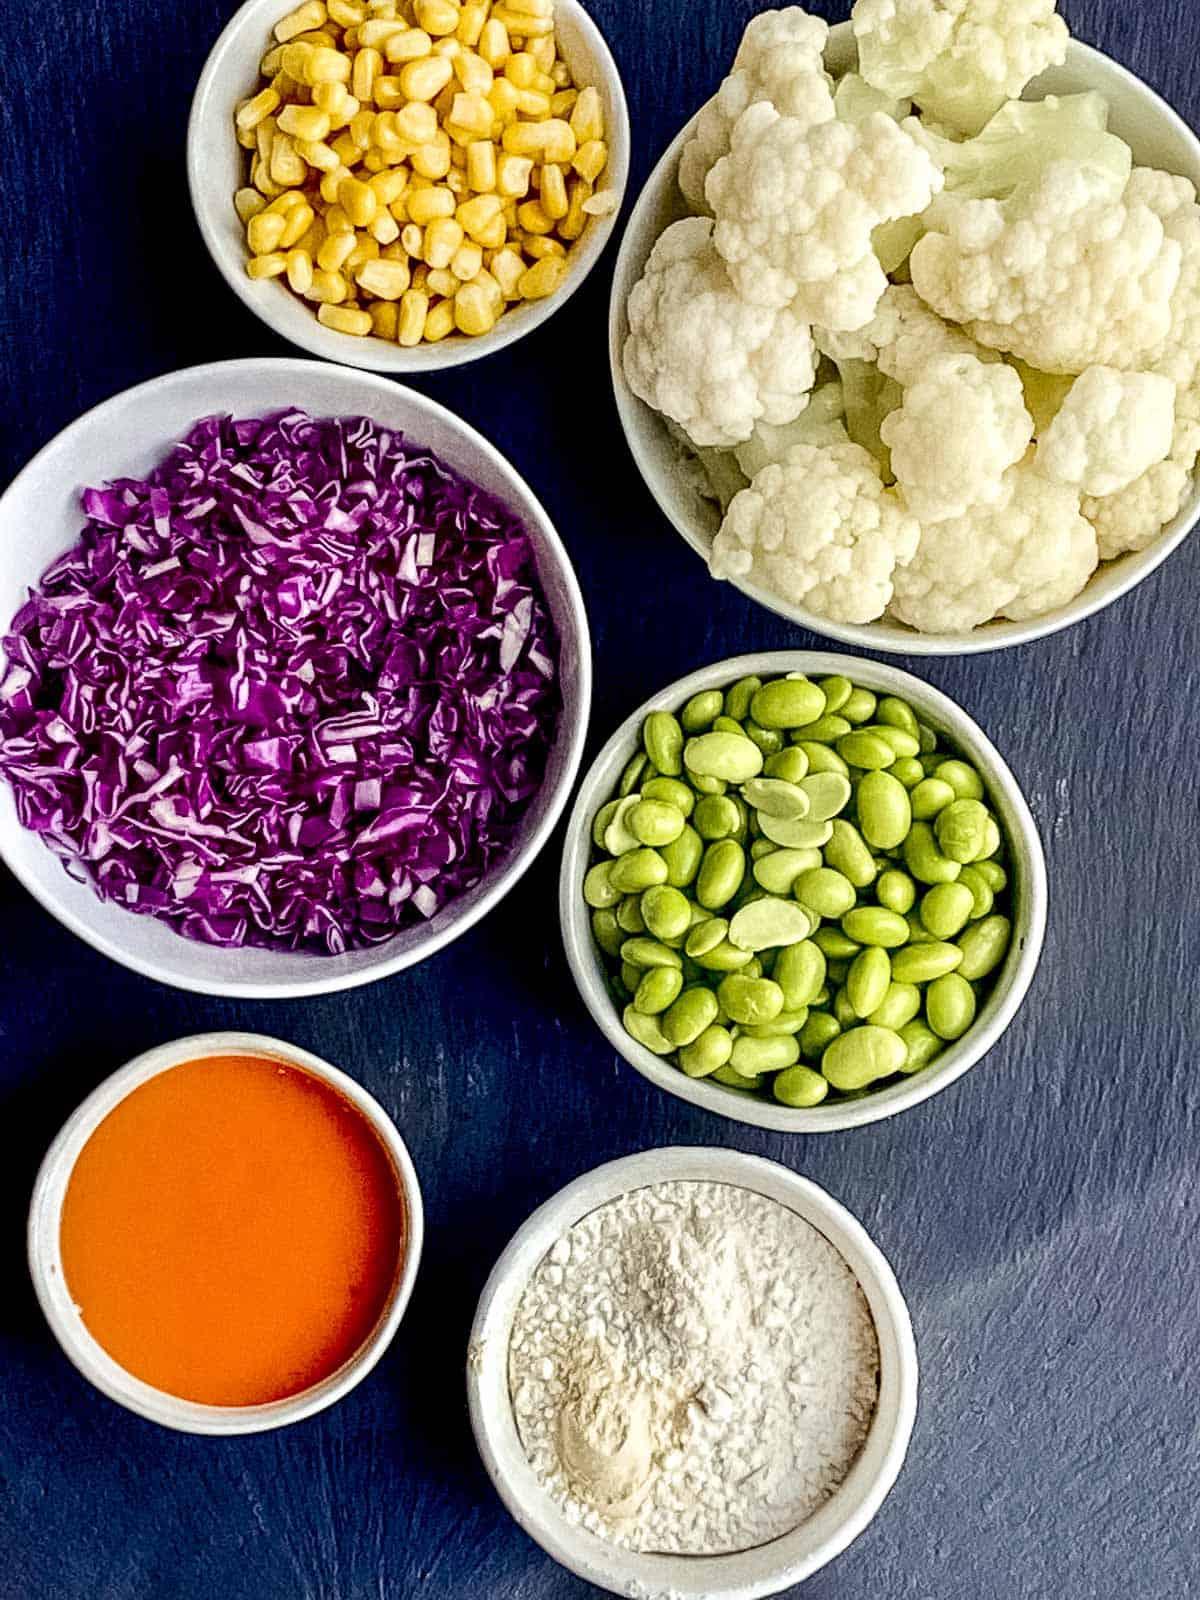 Cauliflower, buffalo sauce, purple cabbage, corn and flour.  The ingredients for make buffalo cauliflower tacos